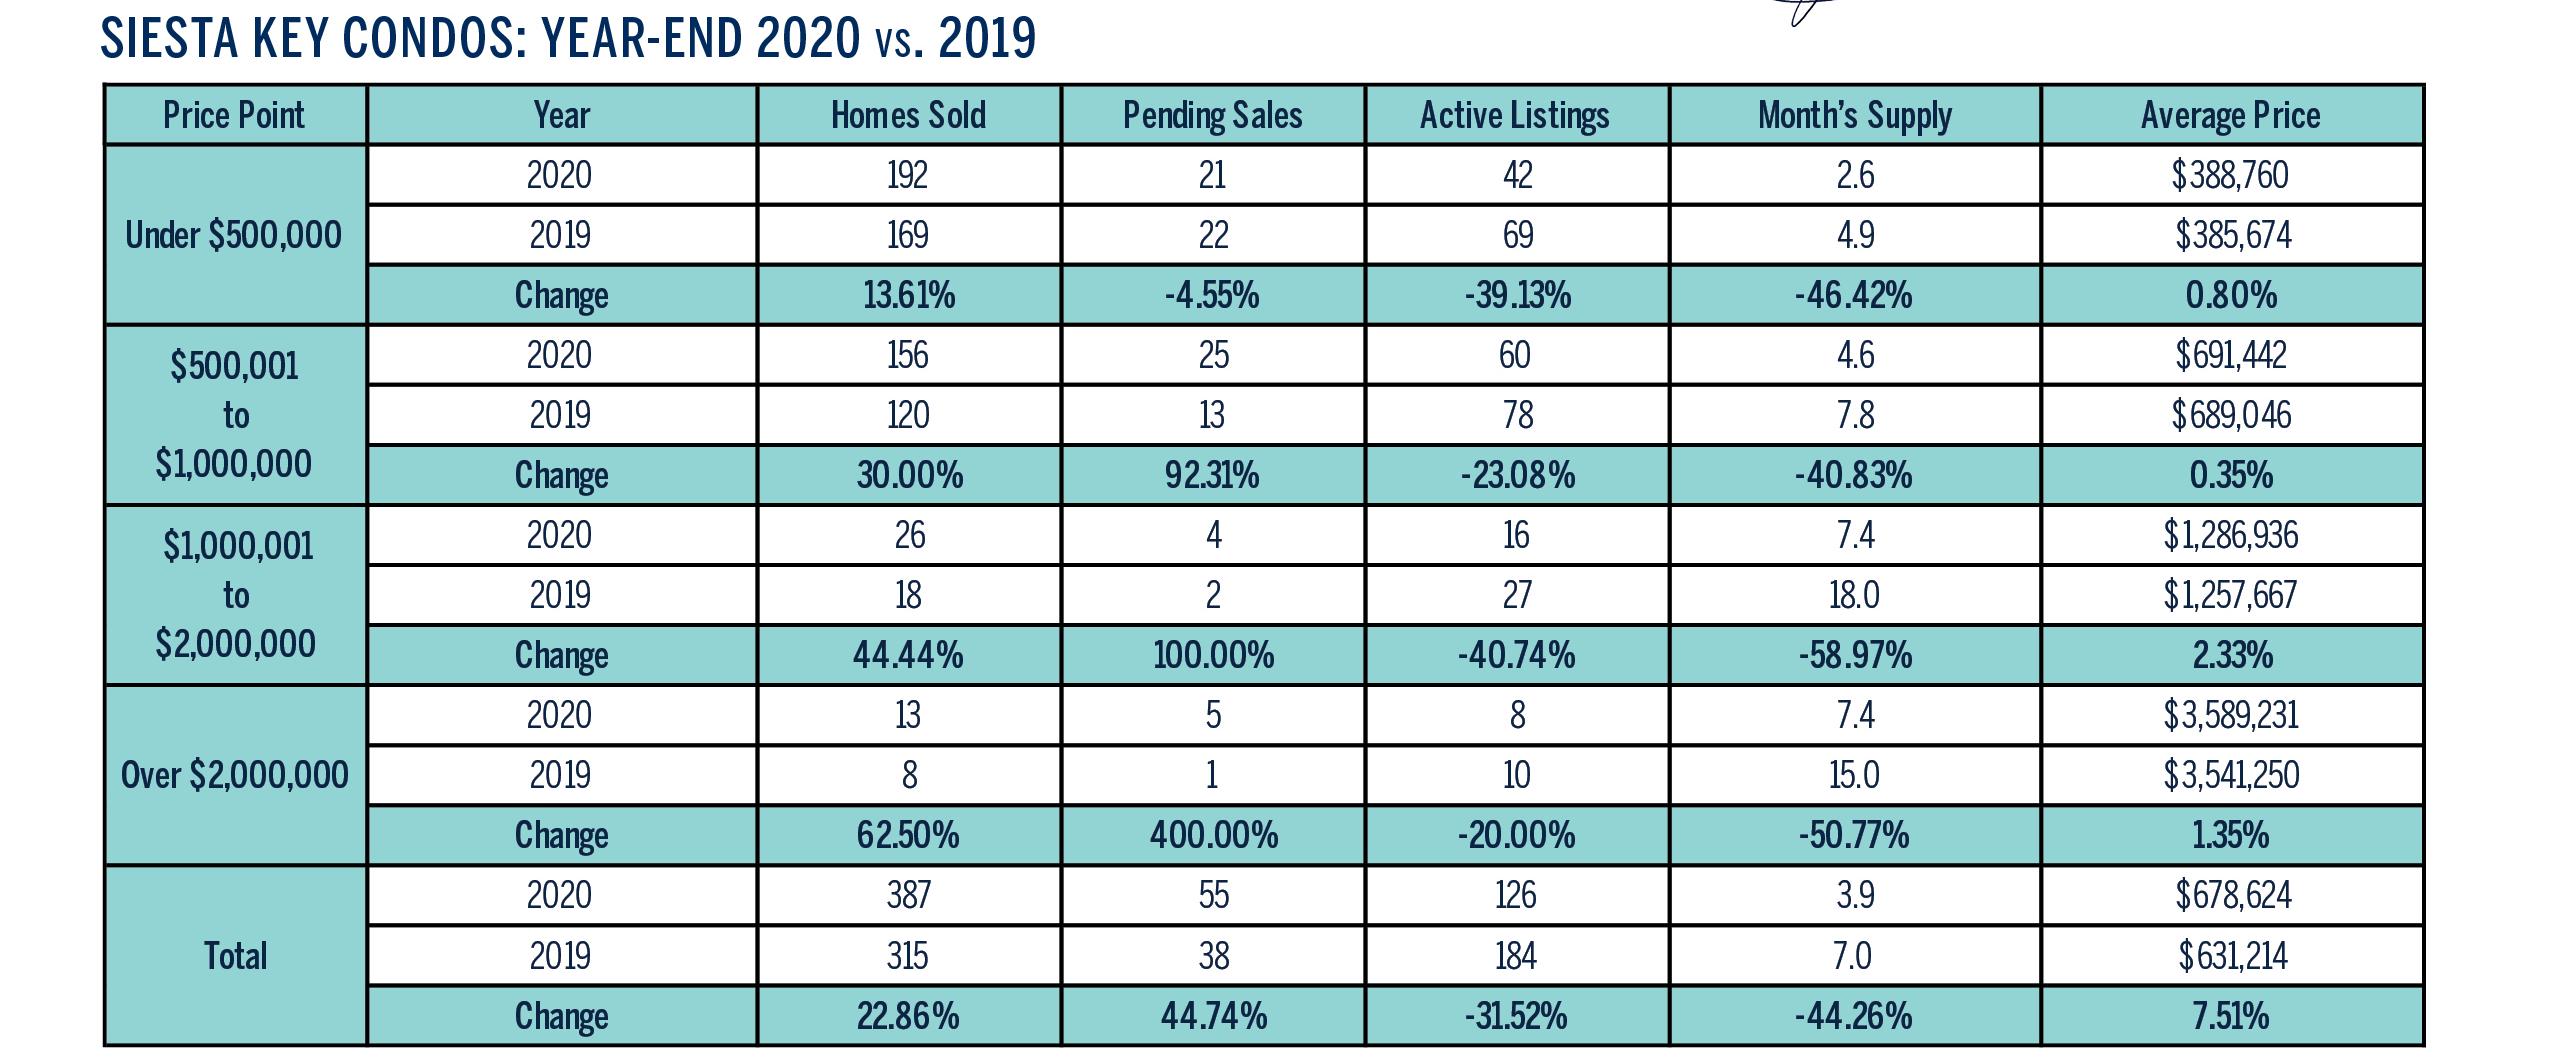 Siesta Key 2020 Year End Real Estate Market Condos